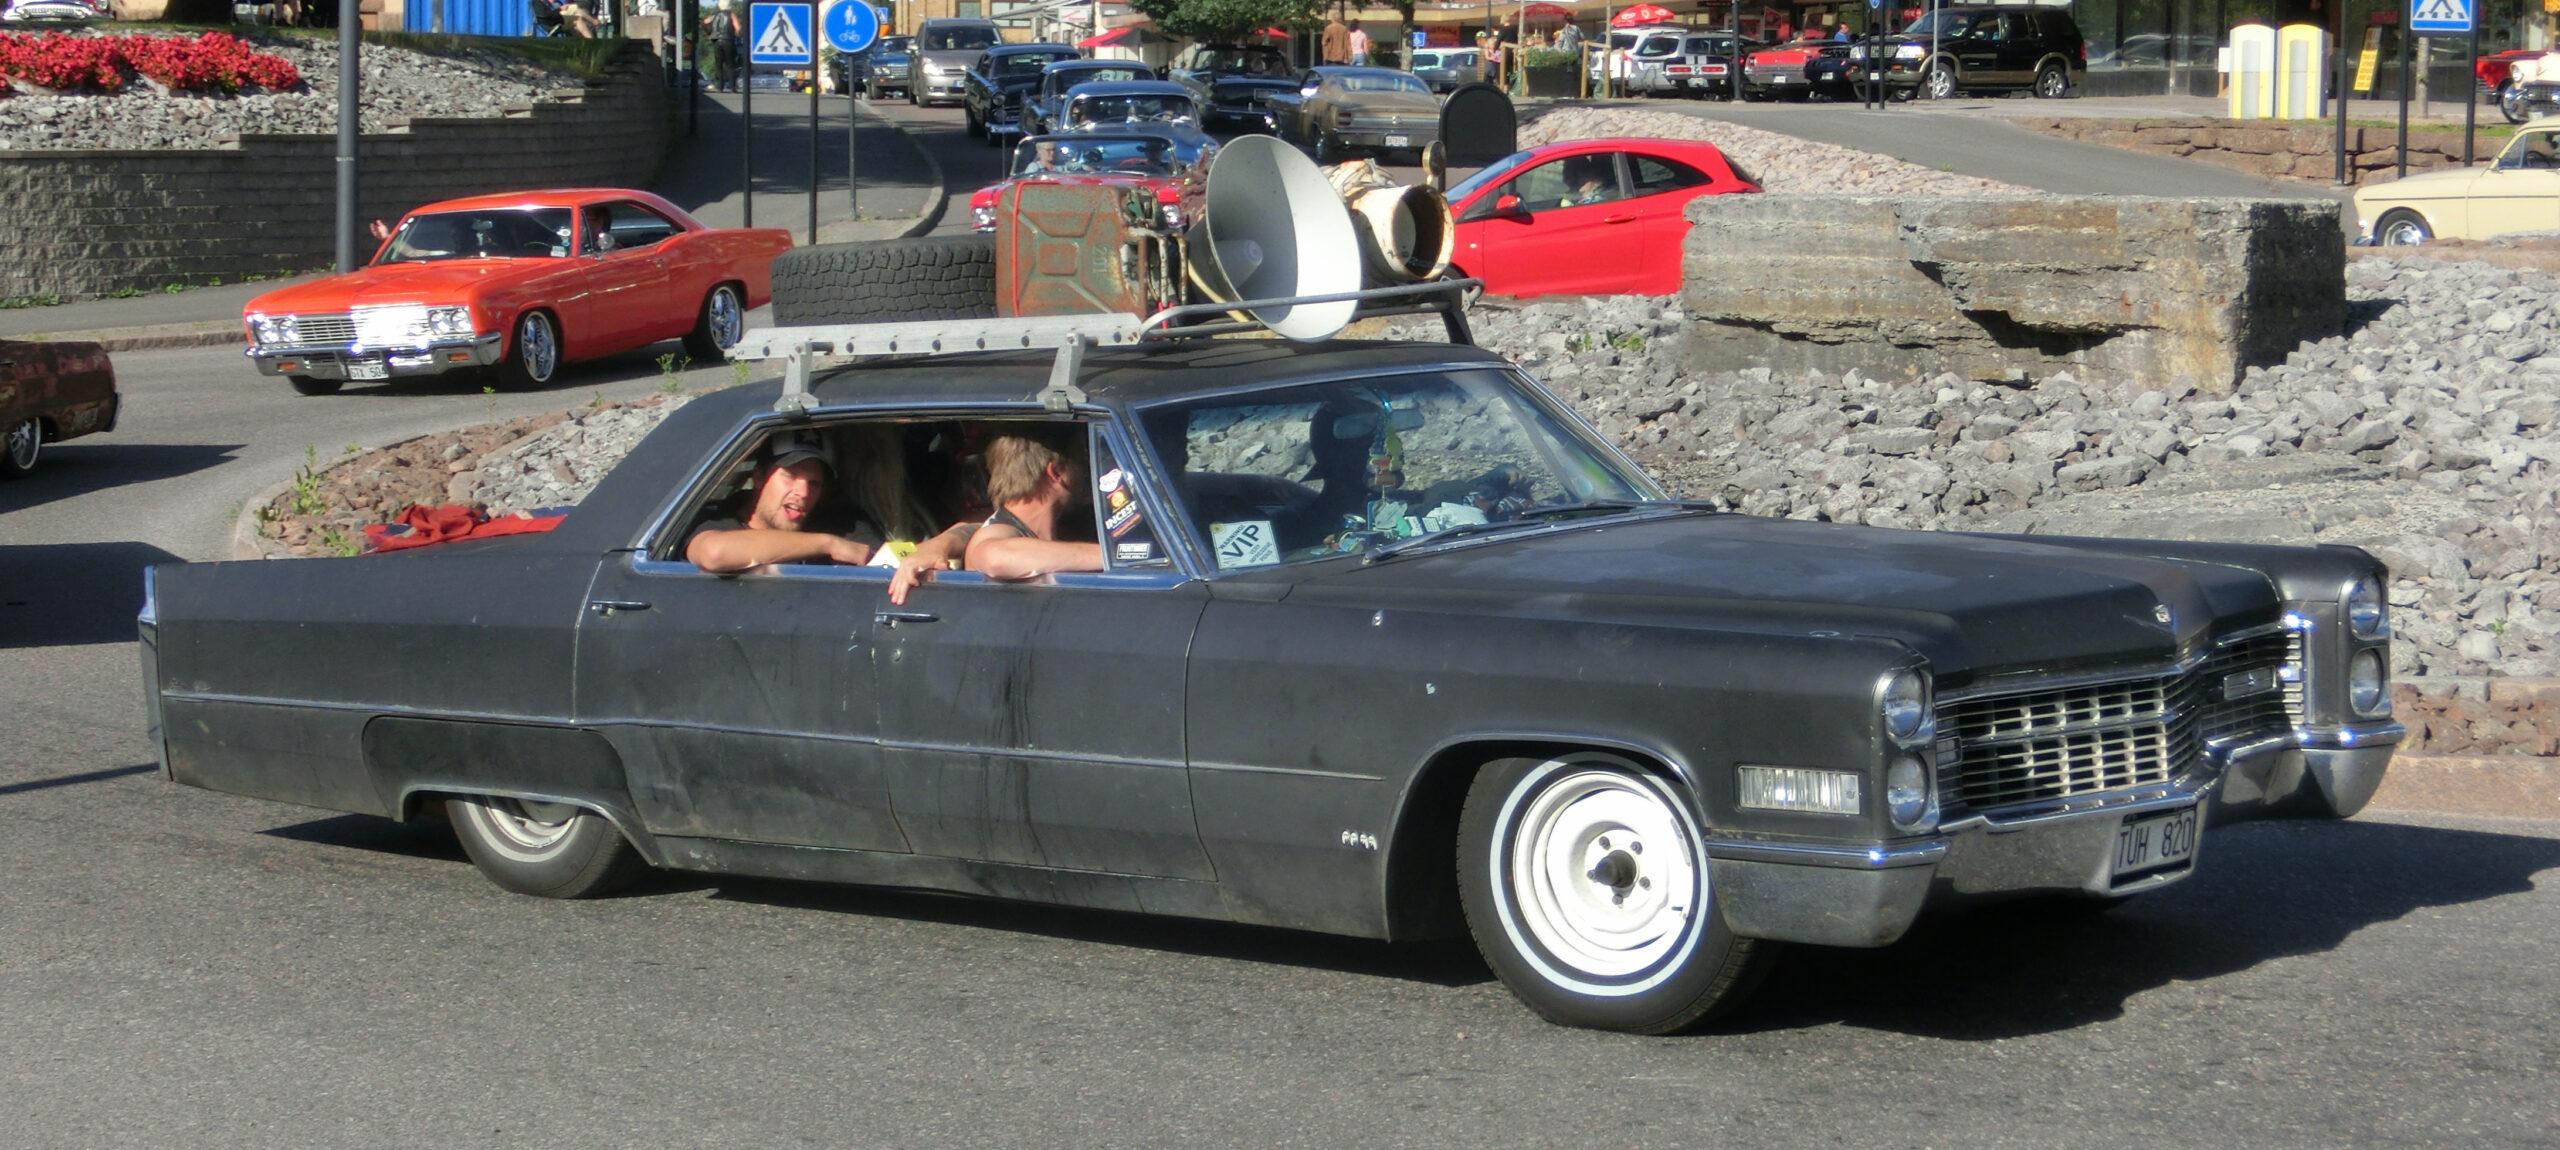 Release 2022 Cadillac Deville